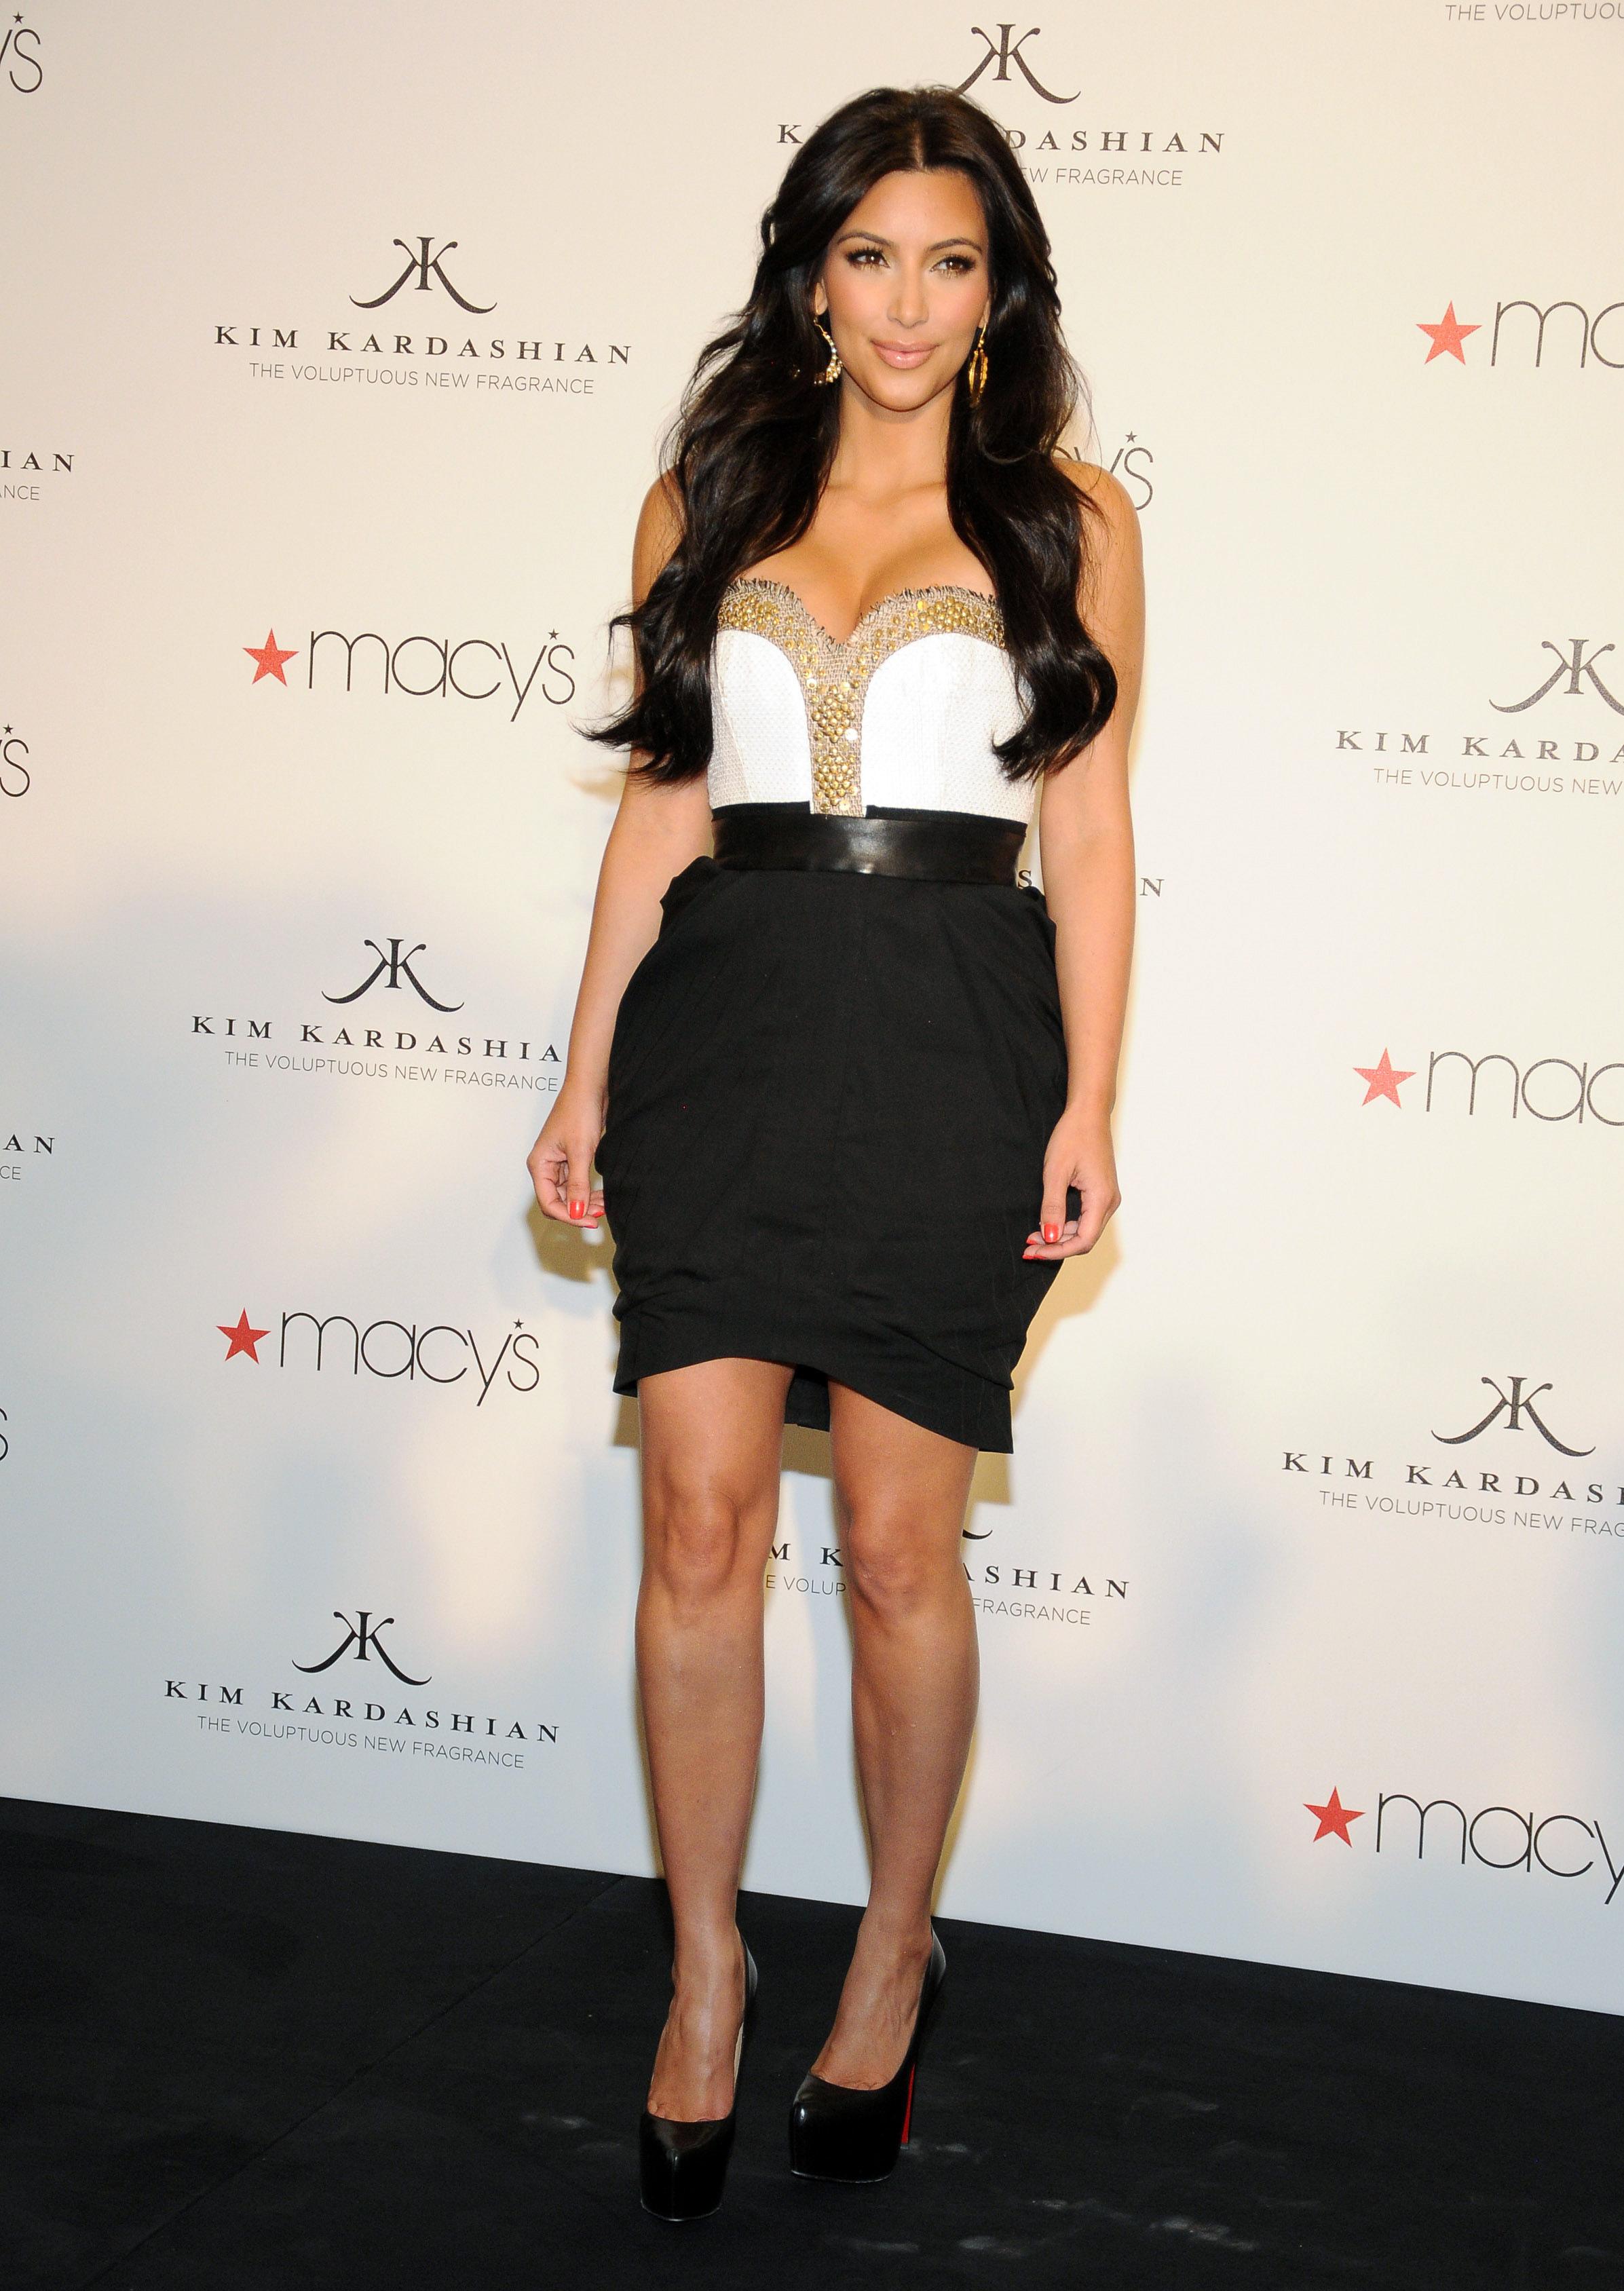 86981_celebrity_paradise.com_Kim_Kardashian_Fragance_62_122_114lo.jpg